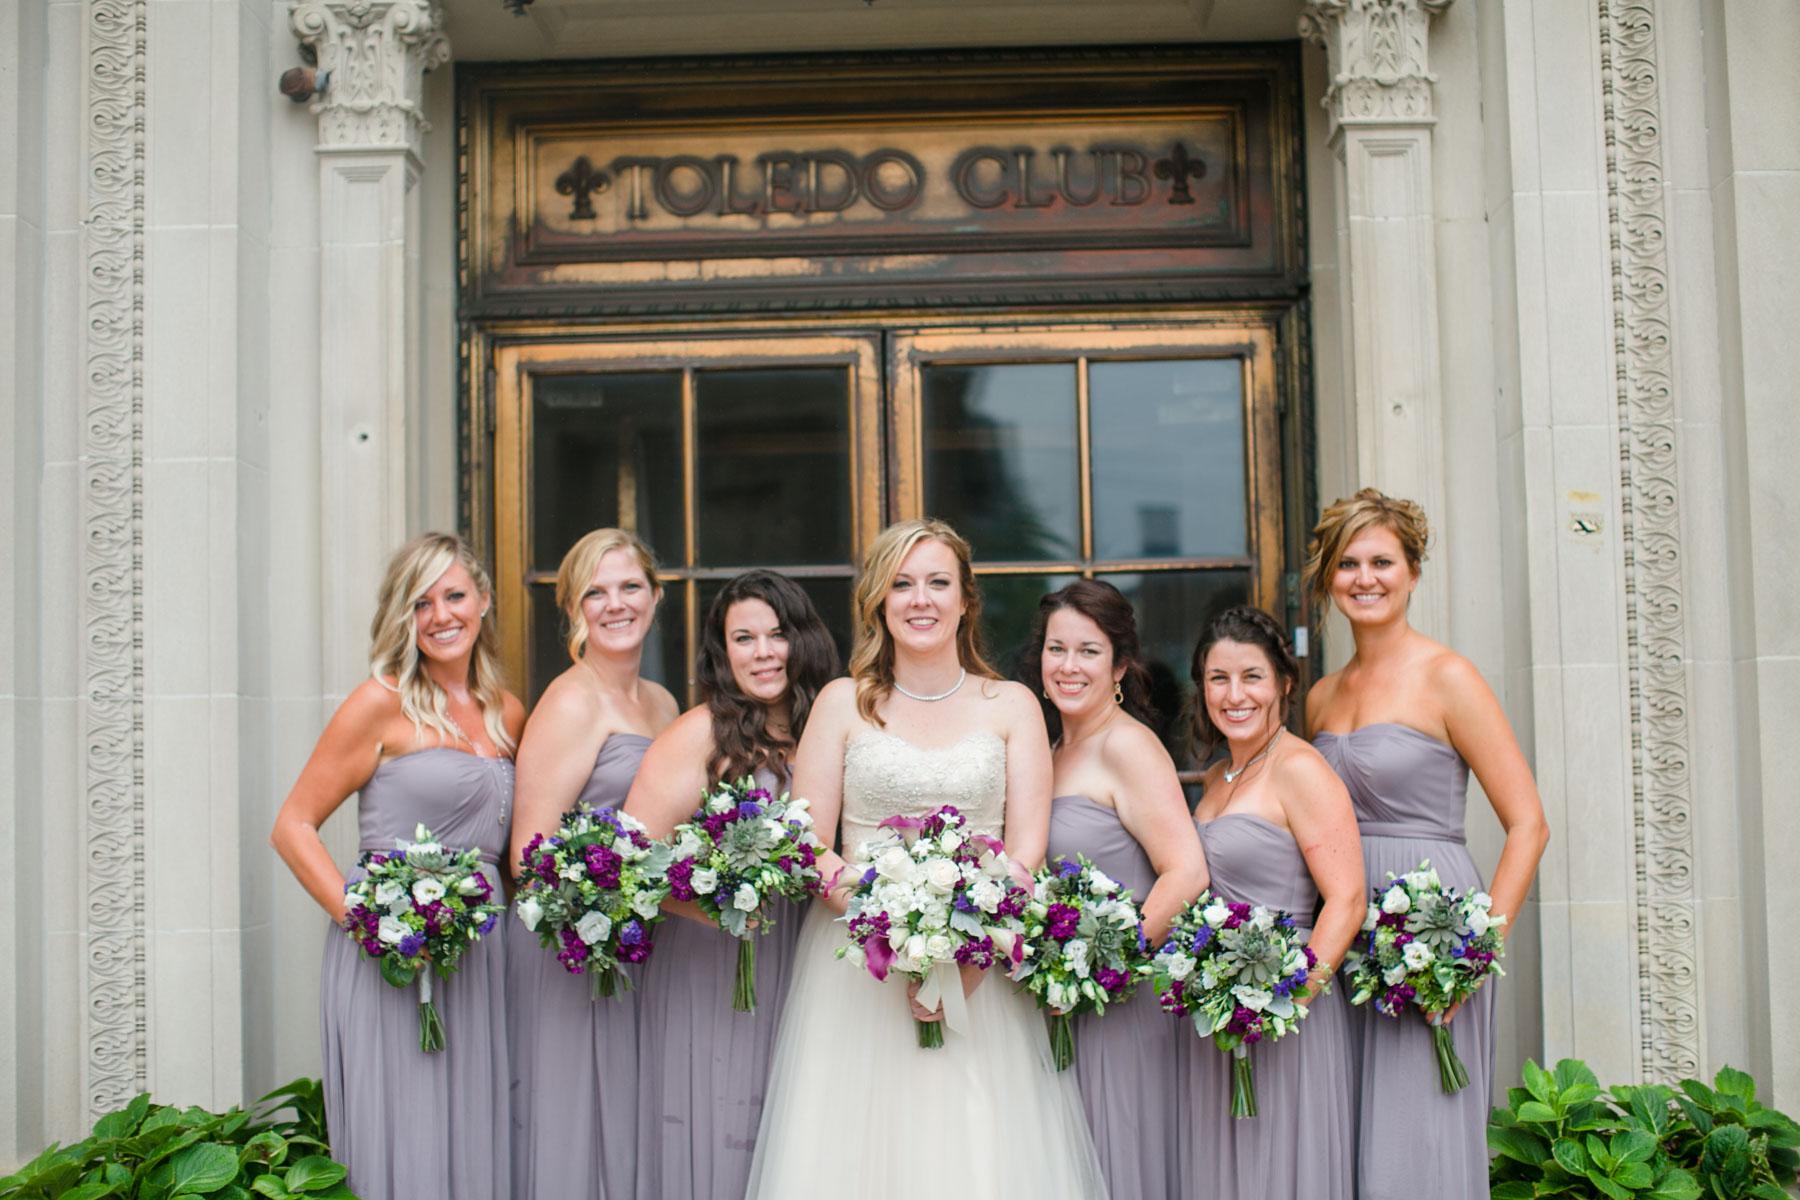 toledo-club-wedding-photos (45 of 101).jpg